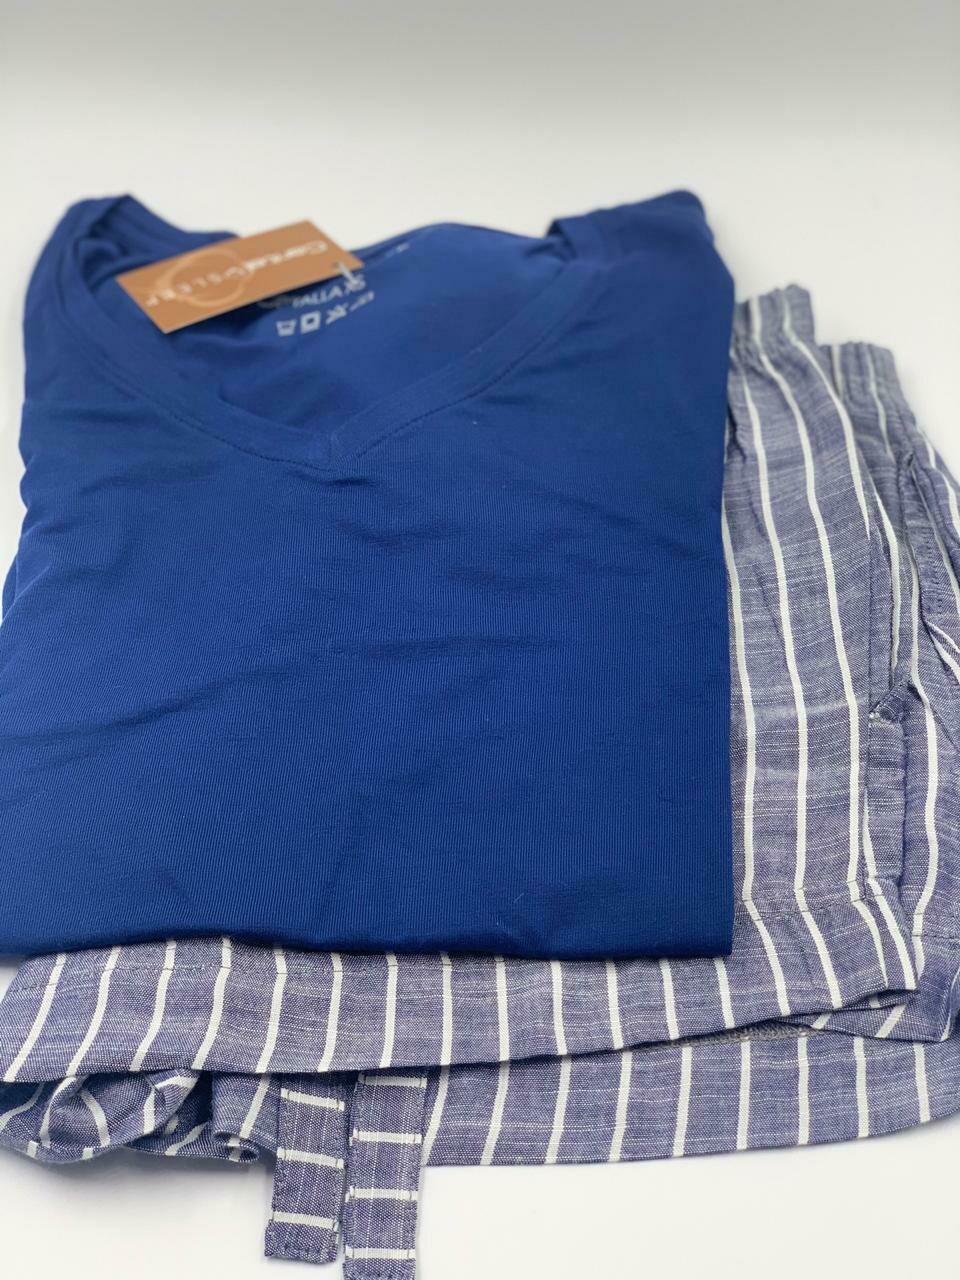 Short Pijama Cantel Sleep Dama Flama Basic Azul Otoño 2020